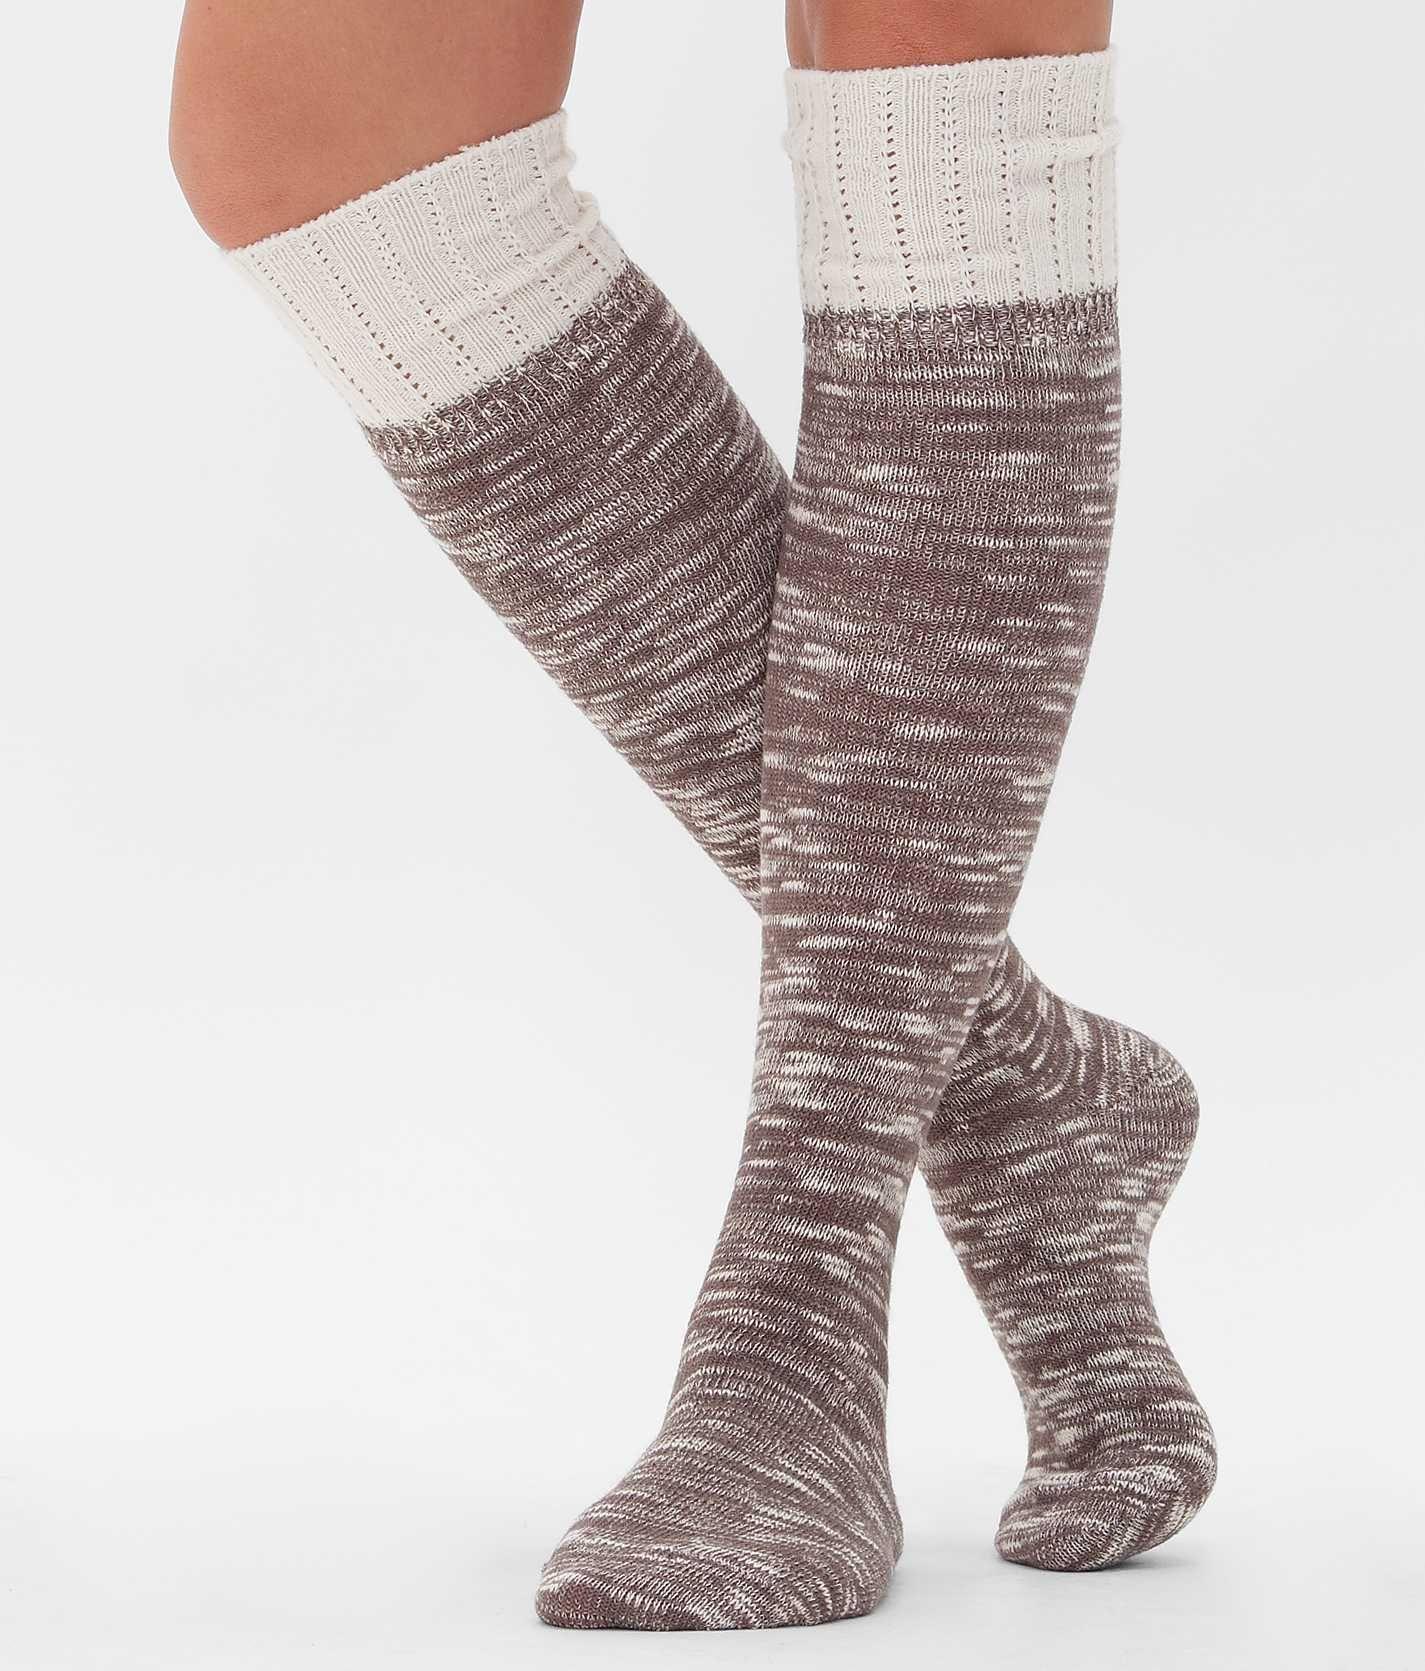 Capelli of New York Knee High Socks - Women's Accessories | Buckle